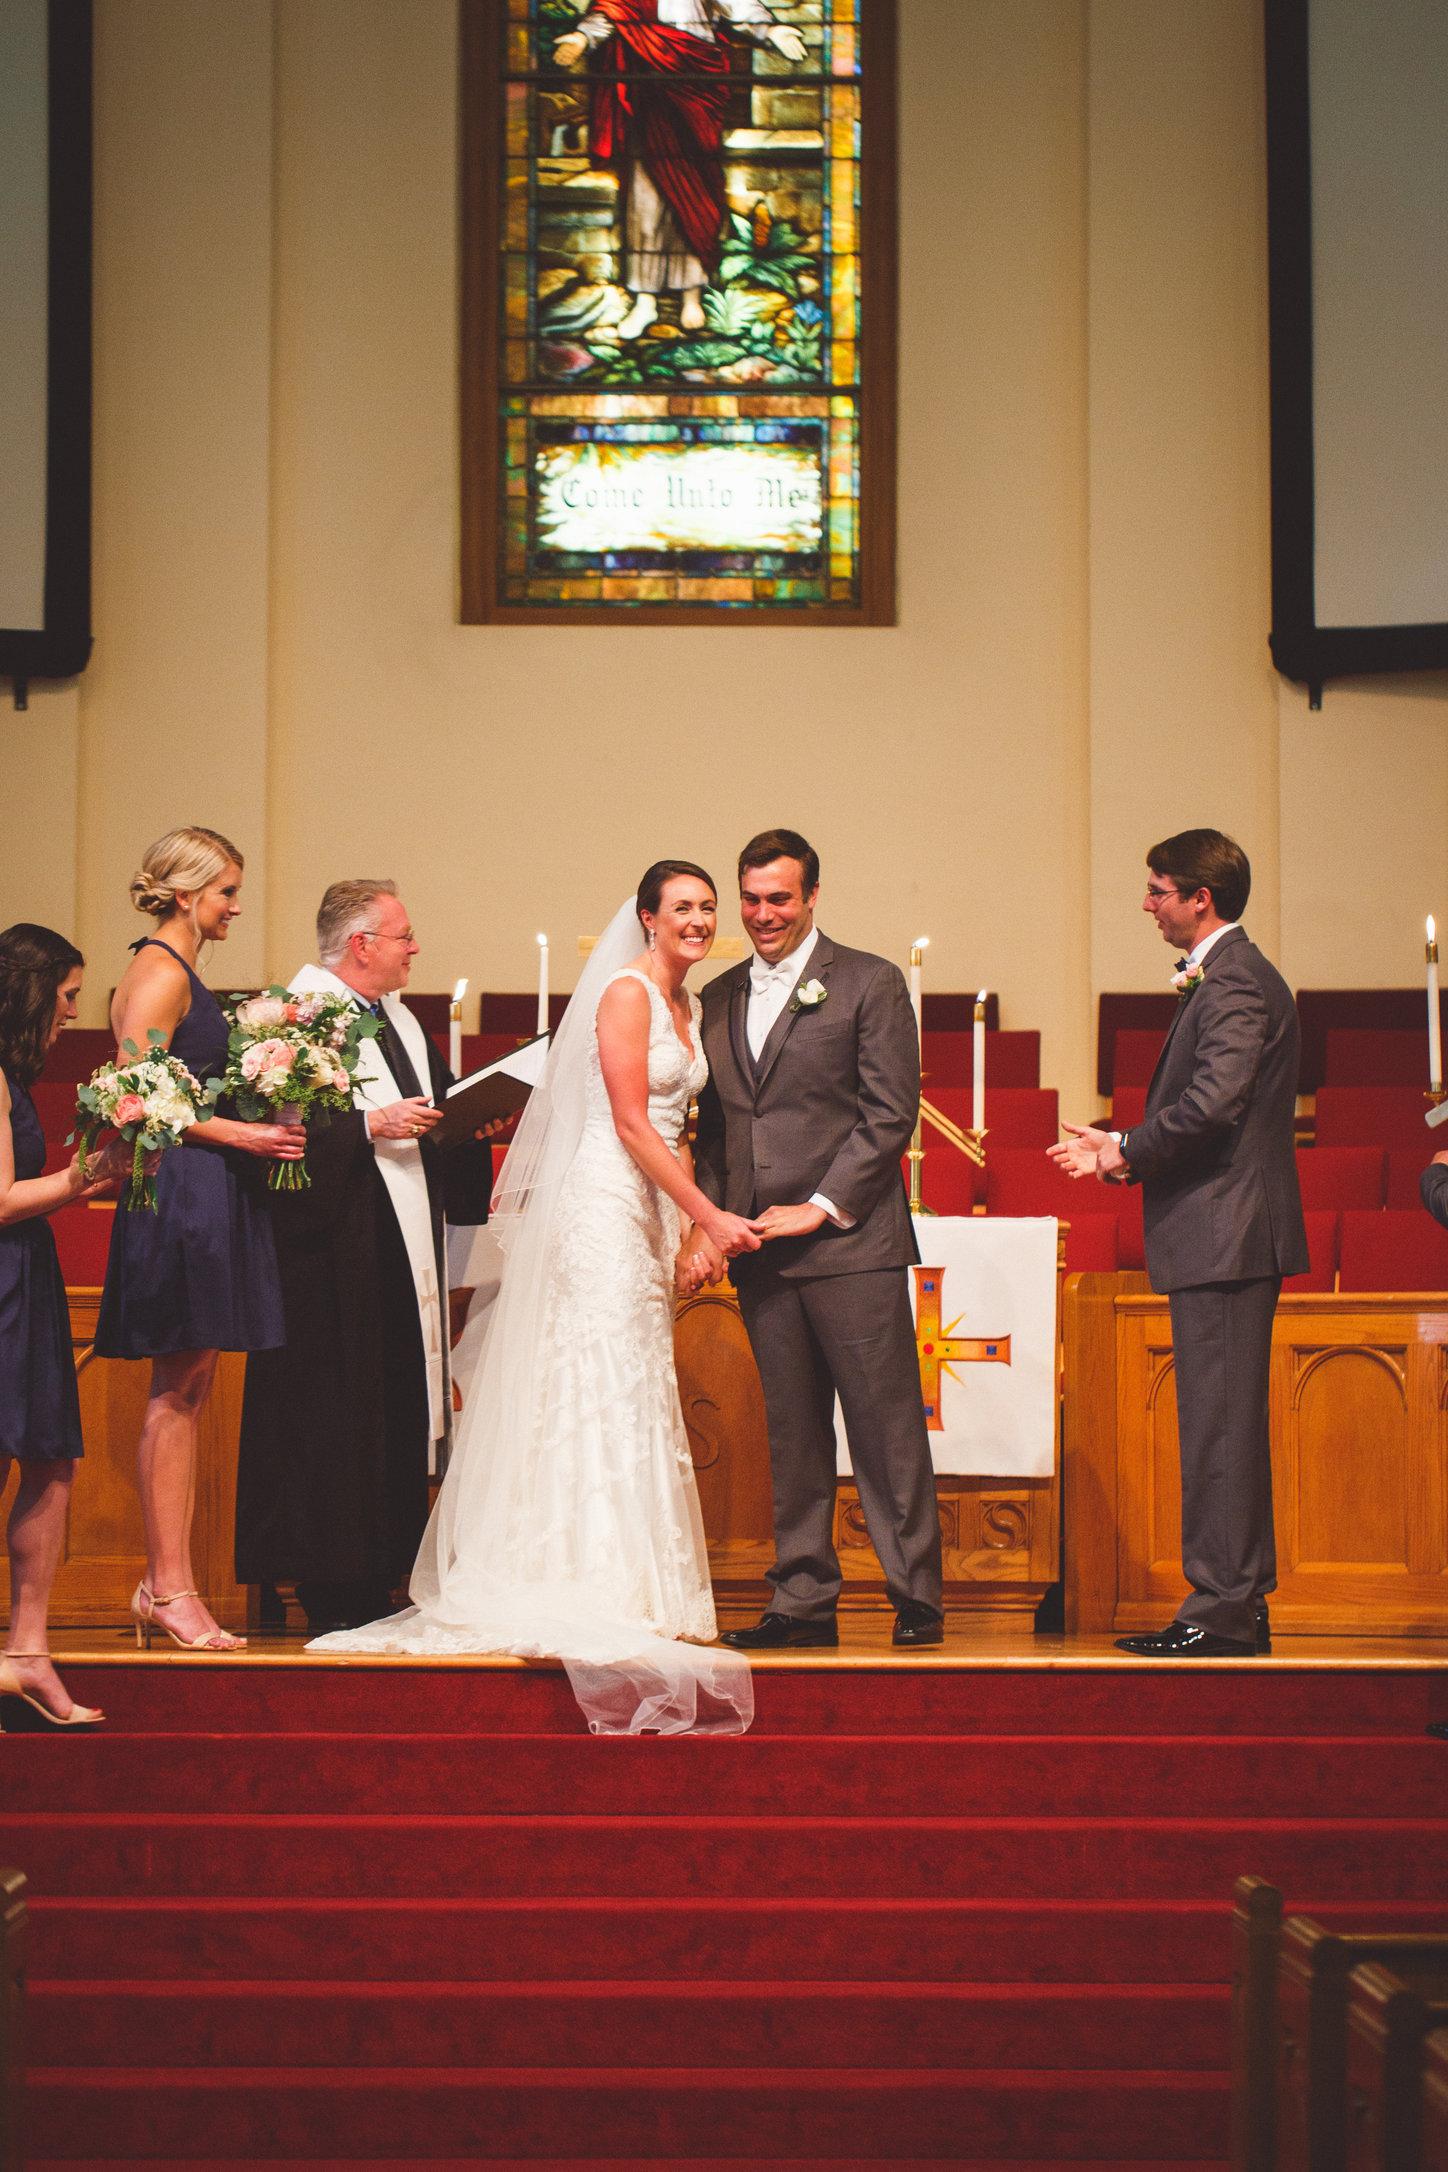 SandC-wedding-225.jpg